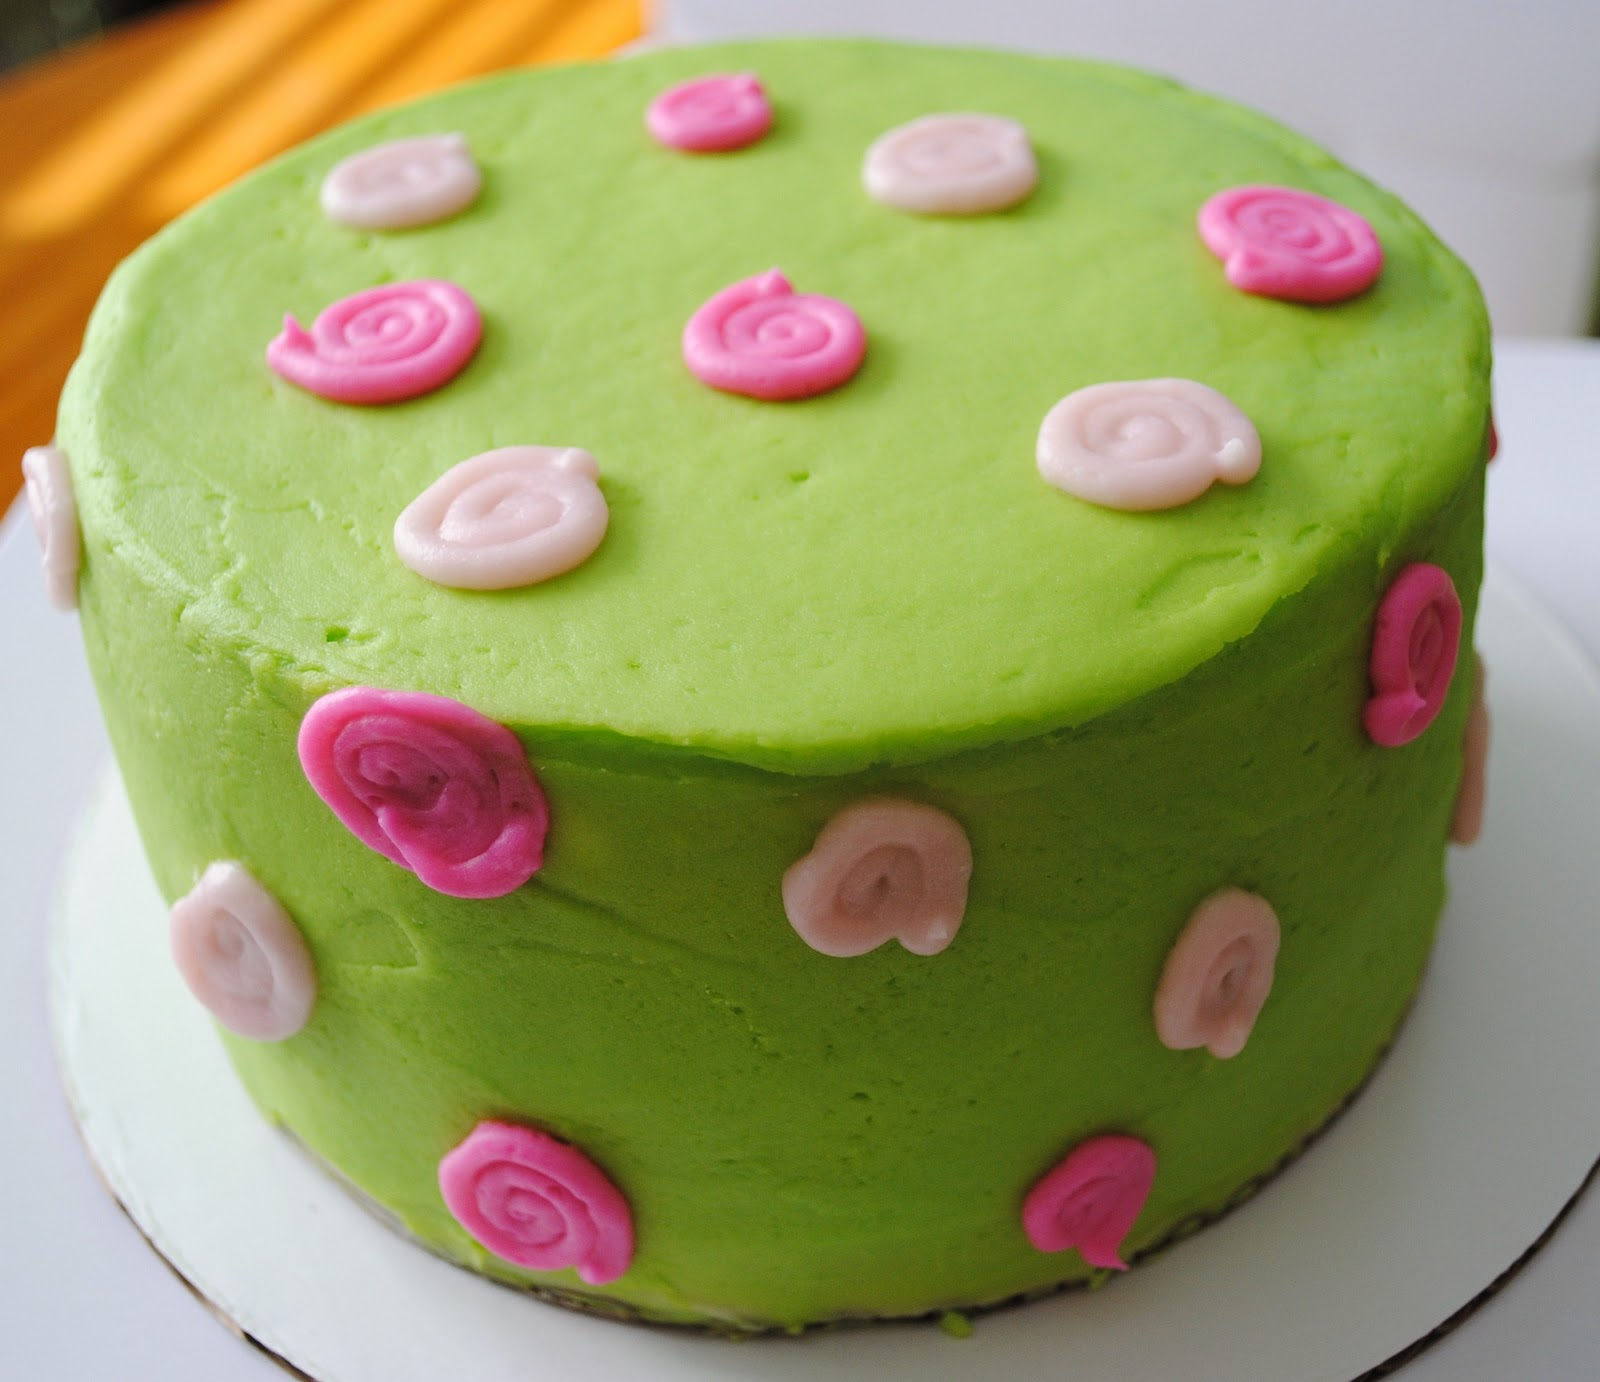 Images Of Homemade Birthday Cake : Homemade By Holman: Classic Yellow Birthday Cake